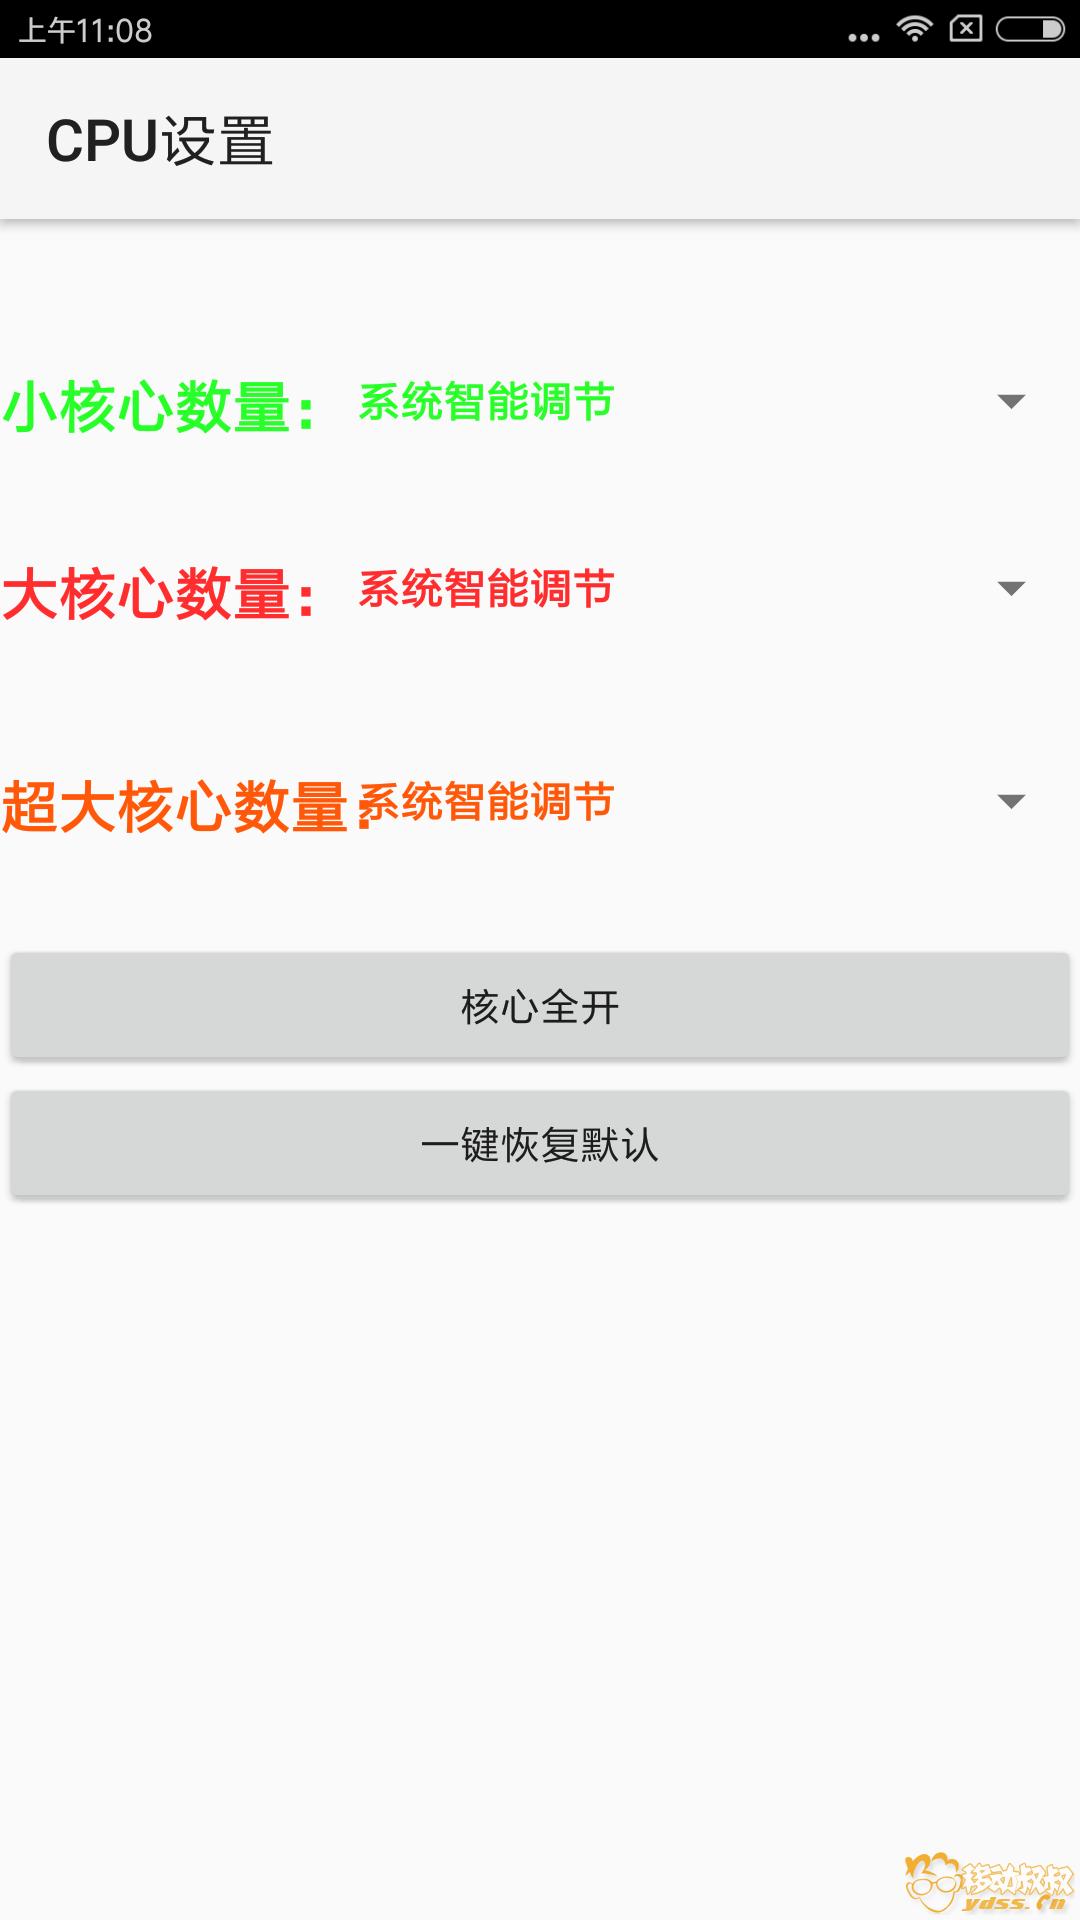 Screenshot_2017-12-24-11-08-14-931_com.eui.xd.png